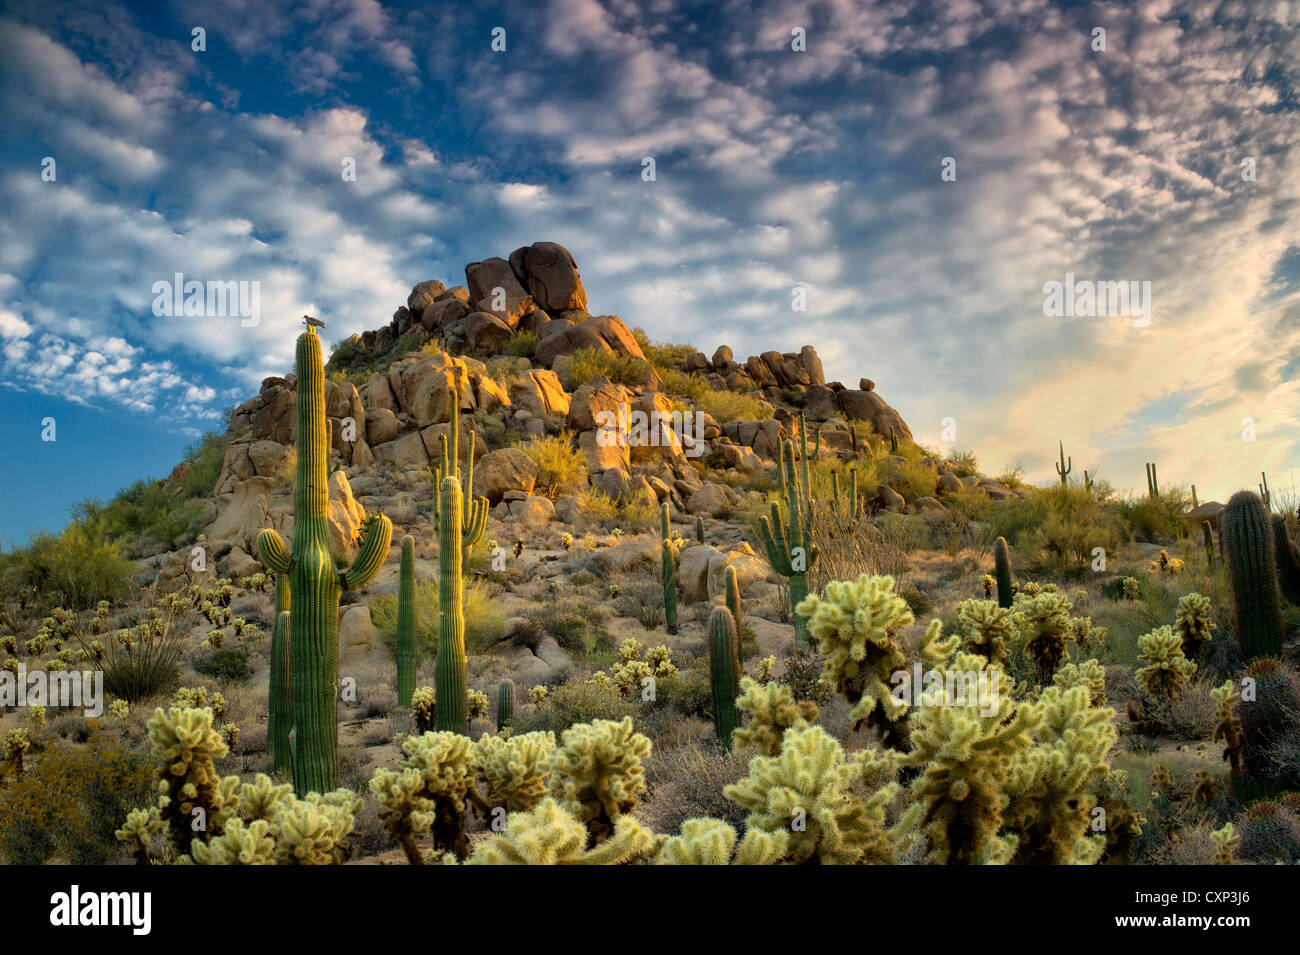 Saguaro and cholla cactus at sunset. Sonoran Desert, Arizona - Stock Image